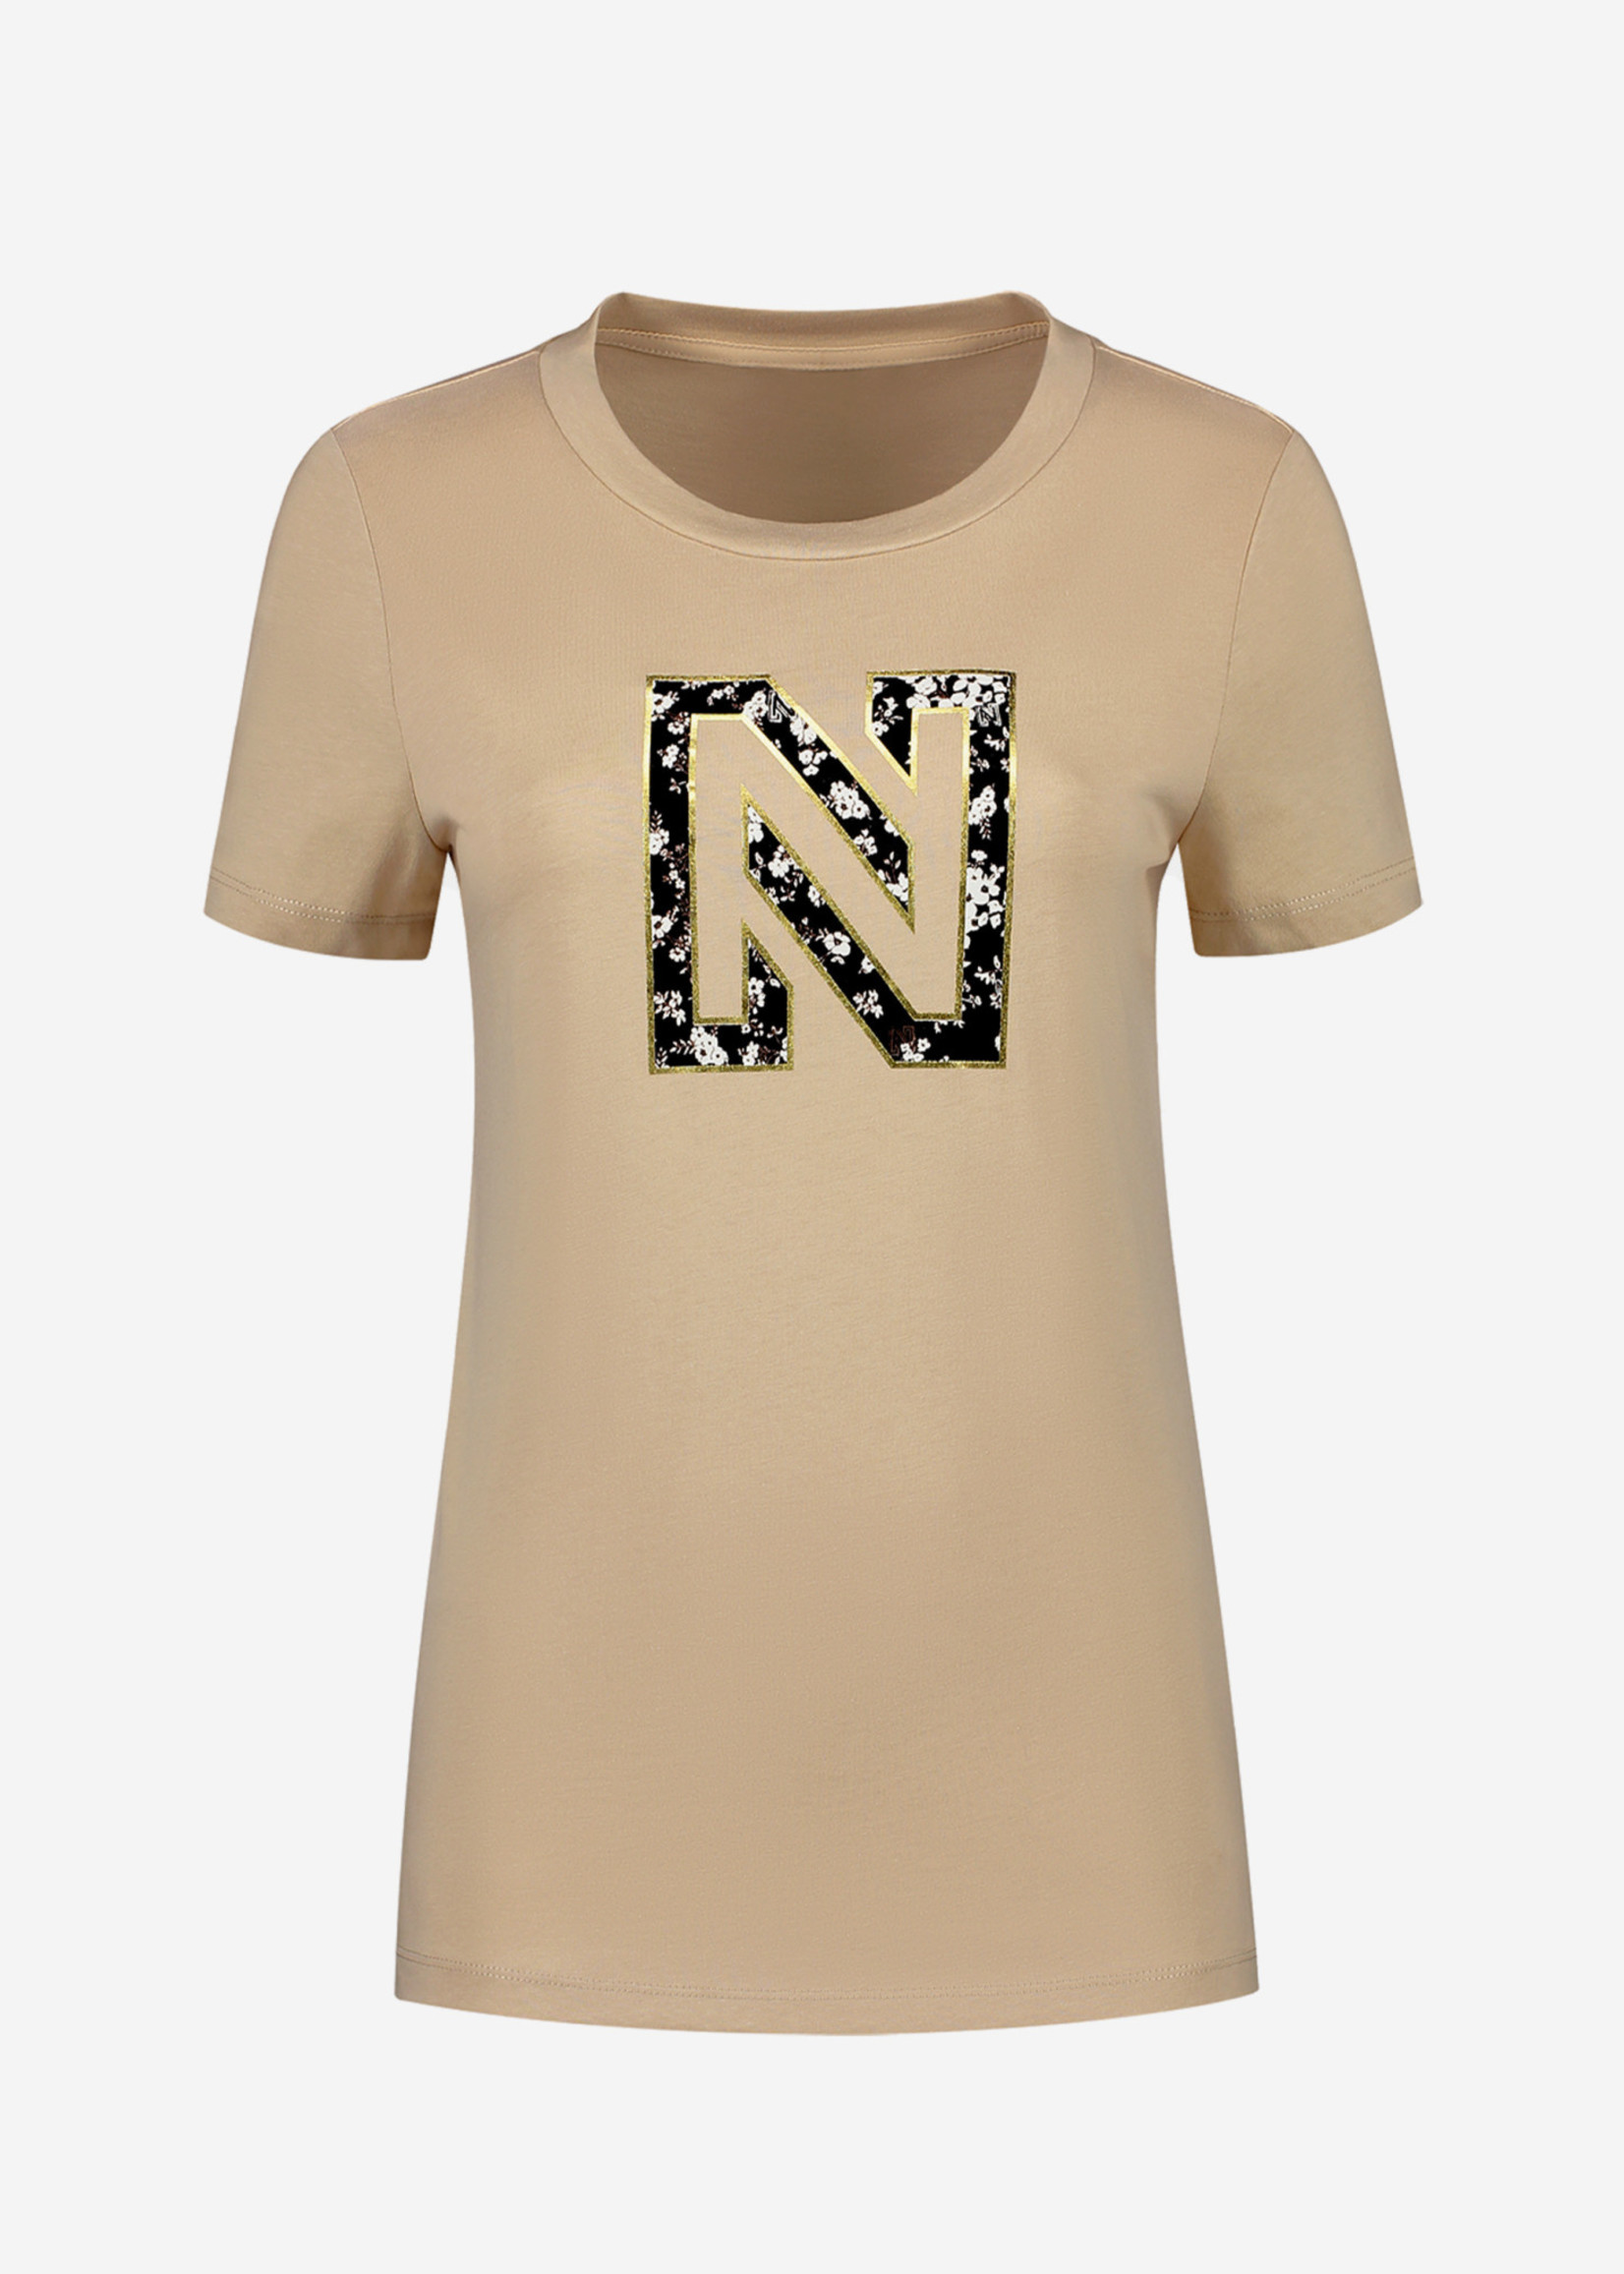 NIKKIE NIKKIE FLOWER LOGO T-SHIRT T-shirt met N logo